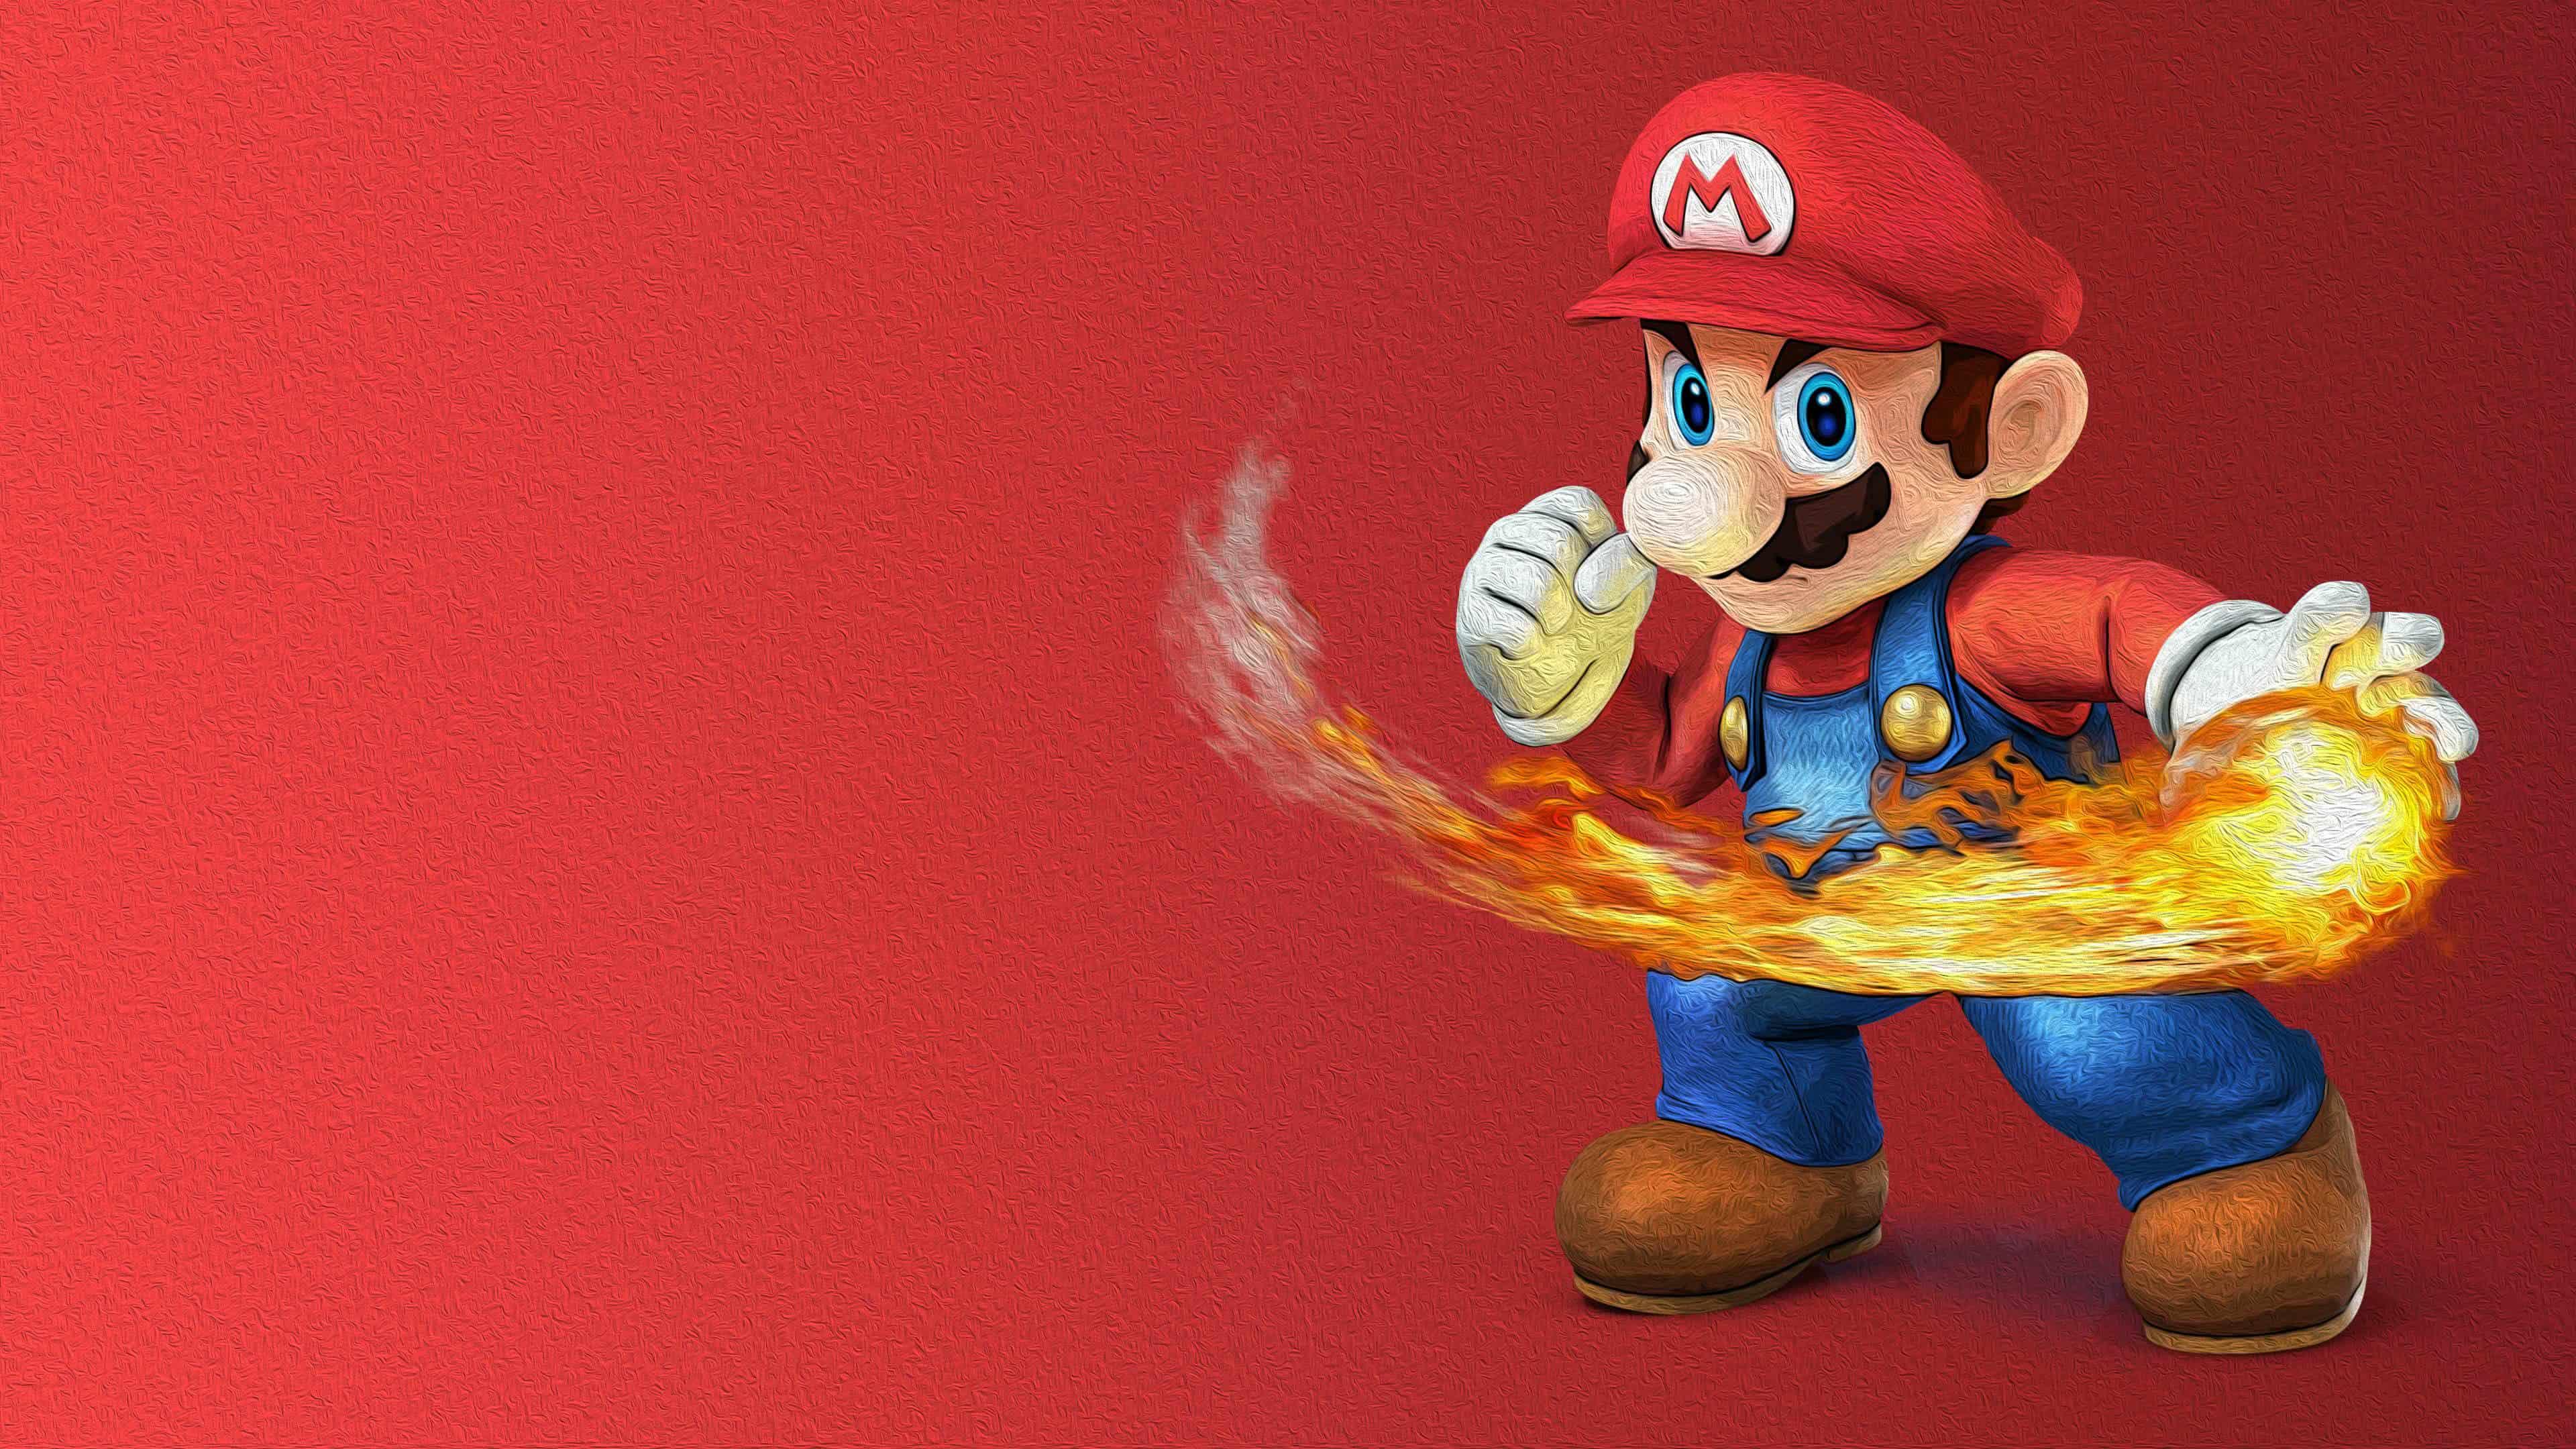 Mario 4k Wallpapers Top Free Mario 4k Backgrounds